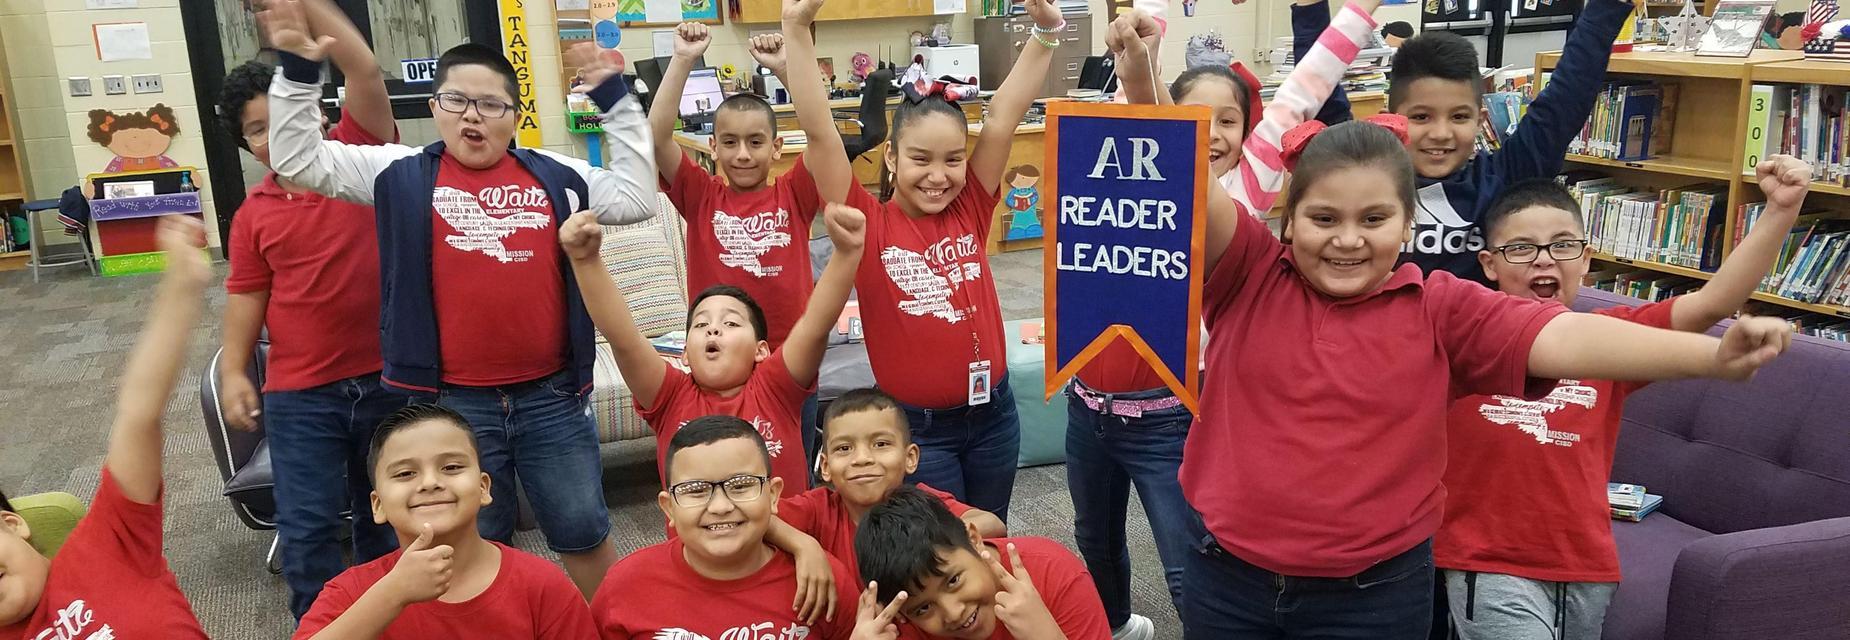 AR reader leader class